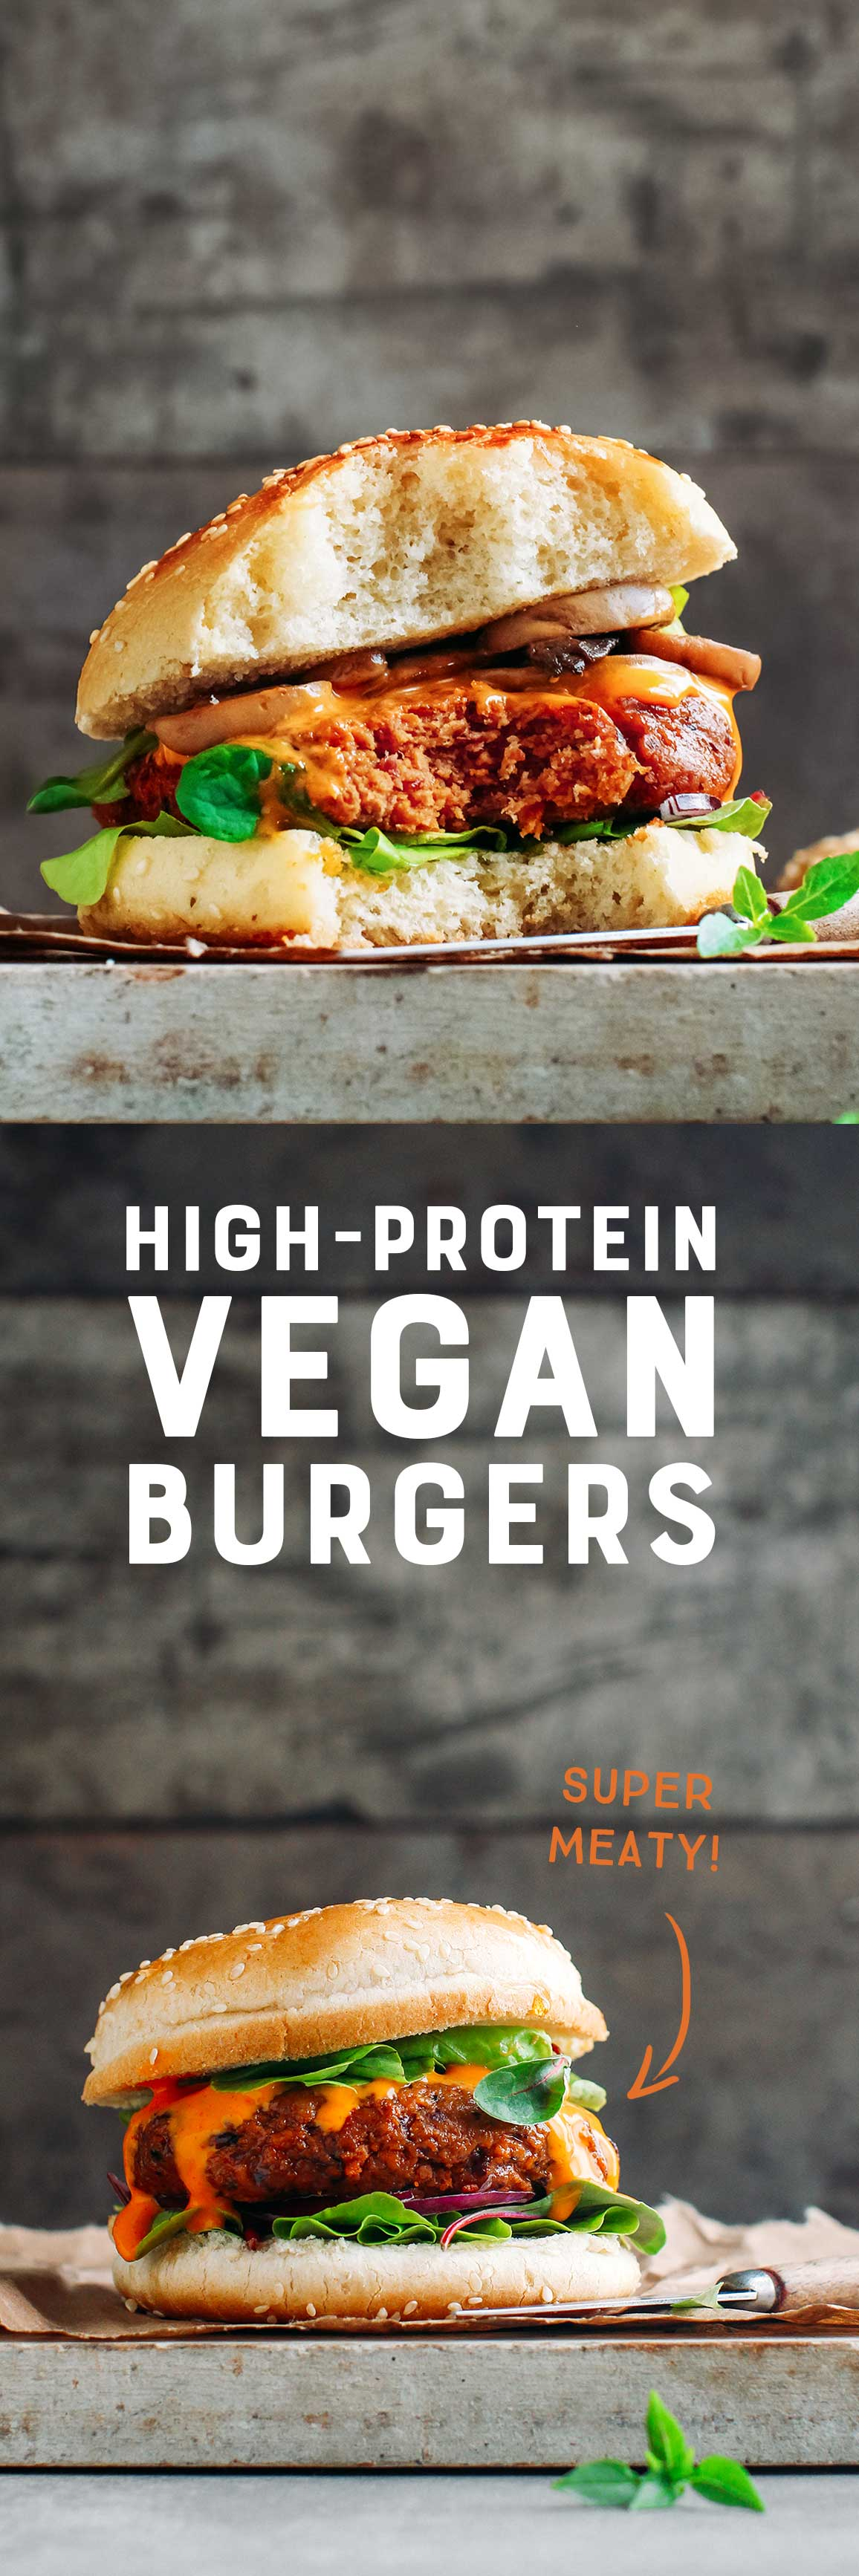 High-Protein Vegan Burgers